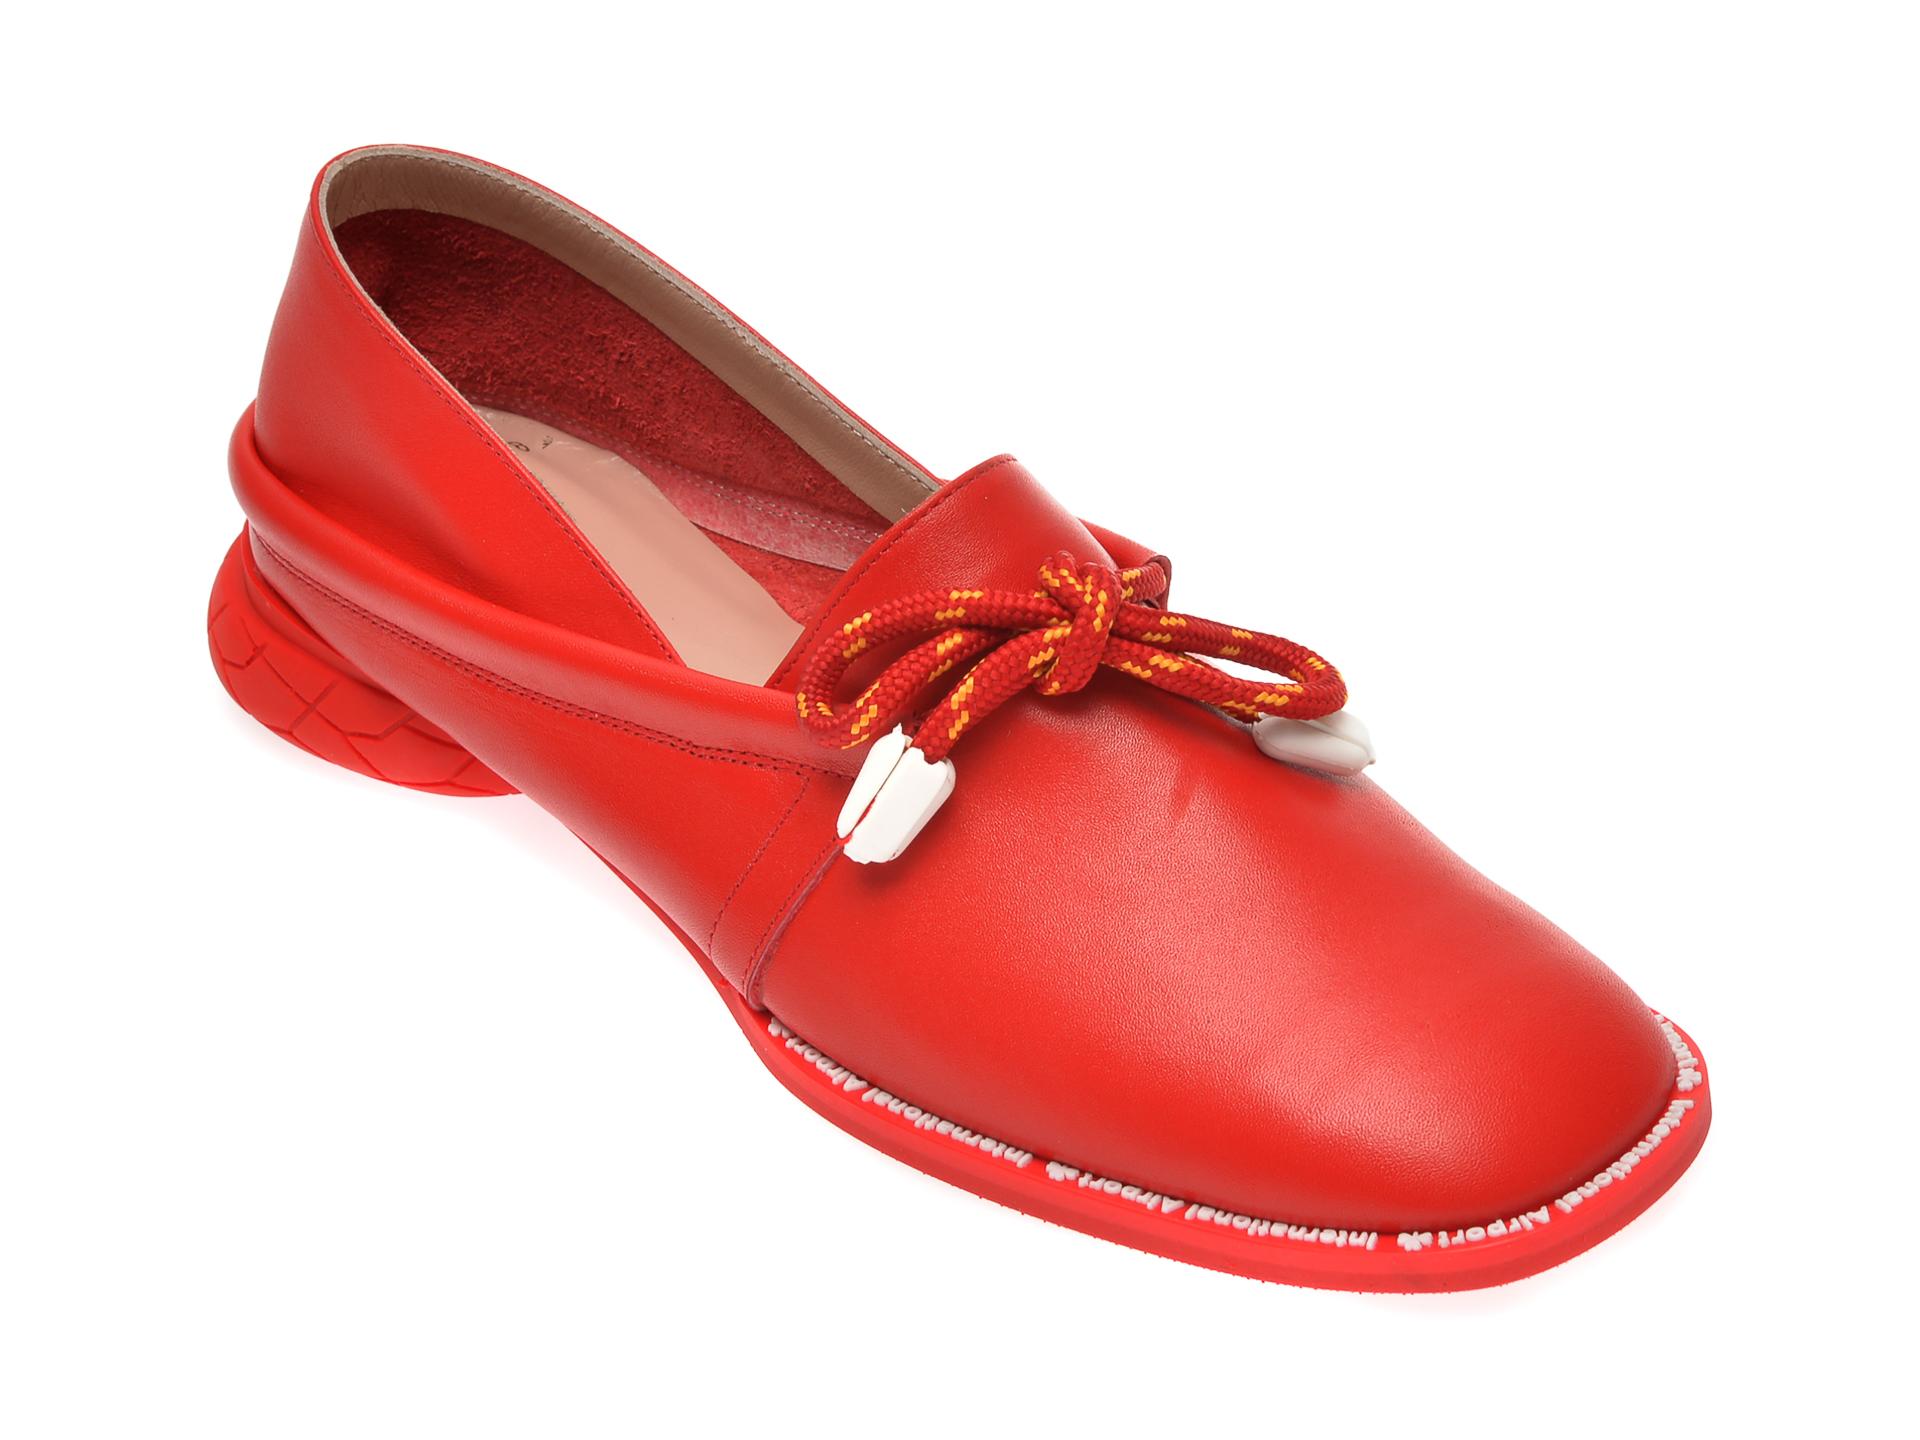 Pantofi FLAVIA PASSINI rosii, GM4515, din piele naturala